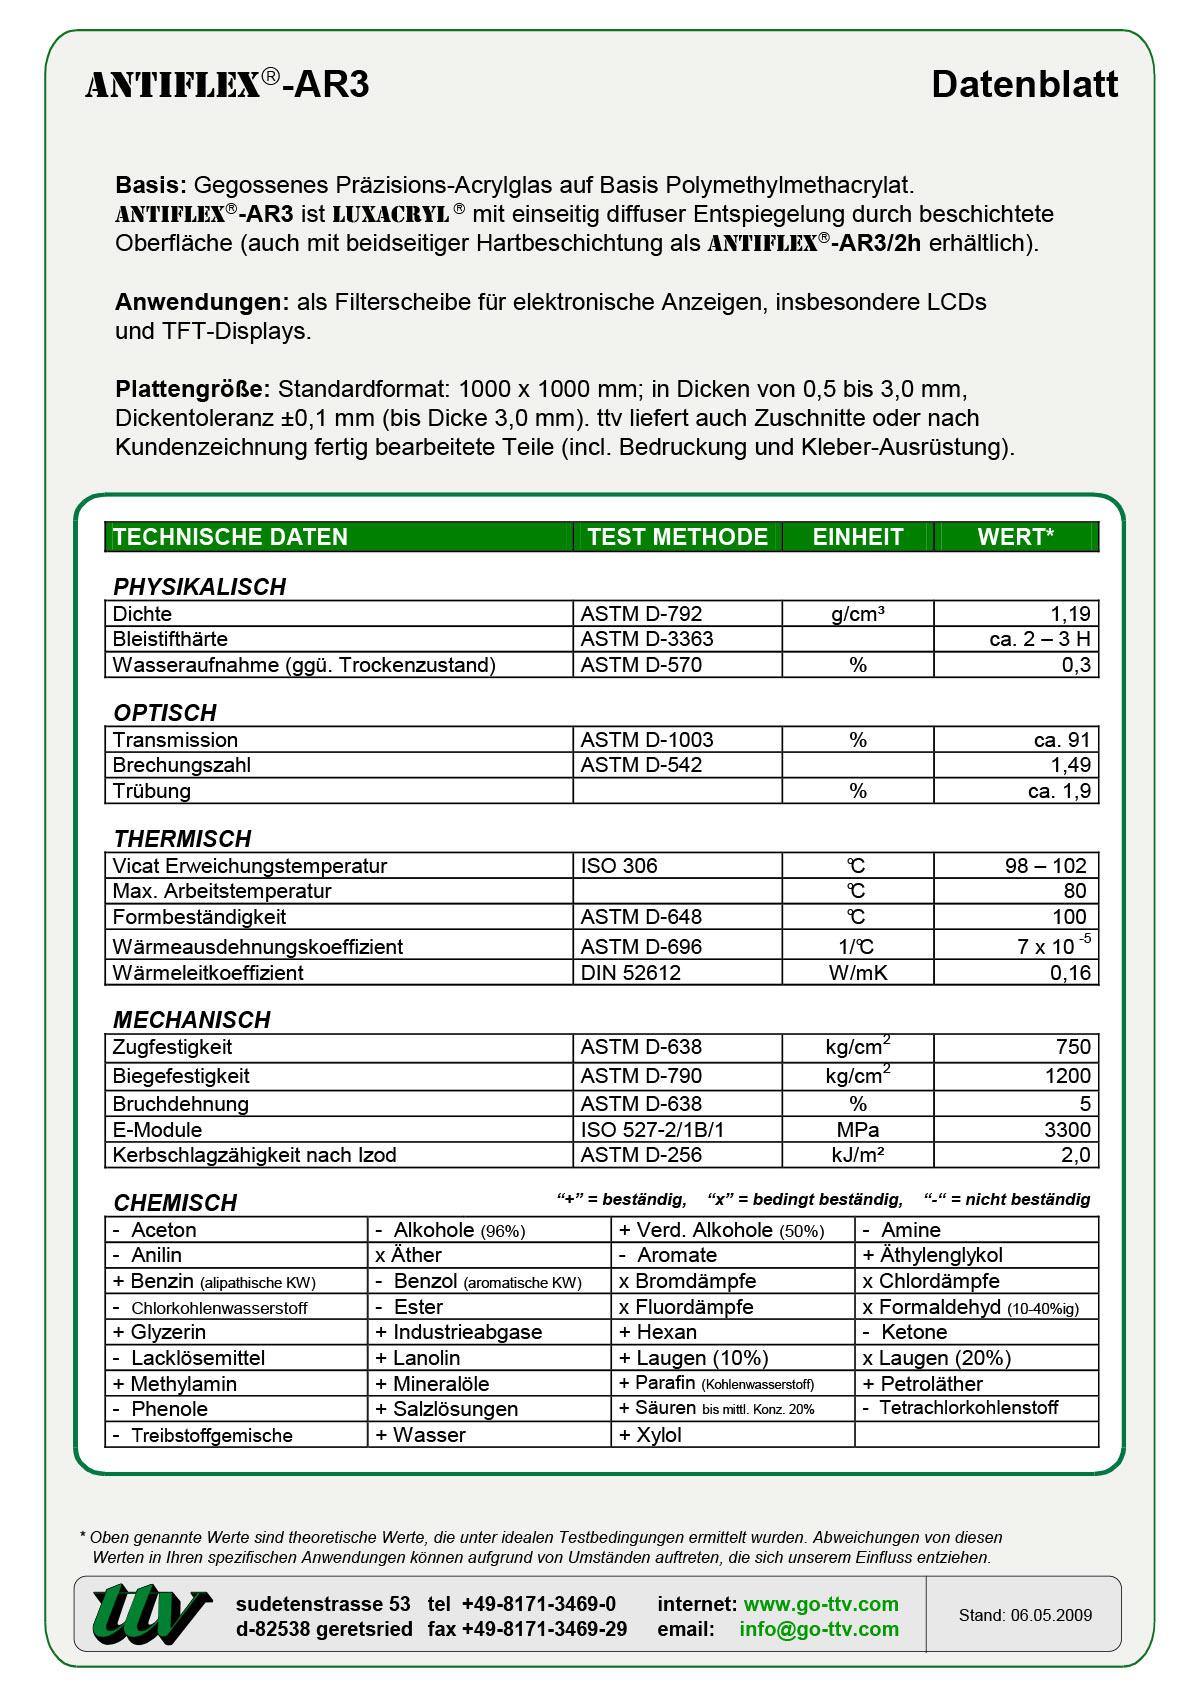 Antiflex-AR3 Datenblatt